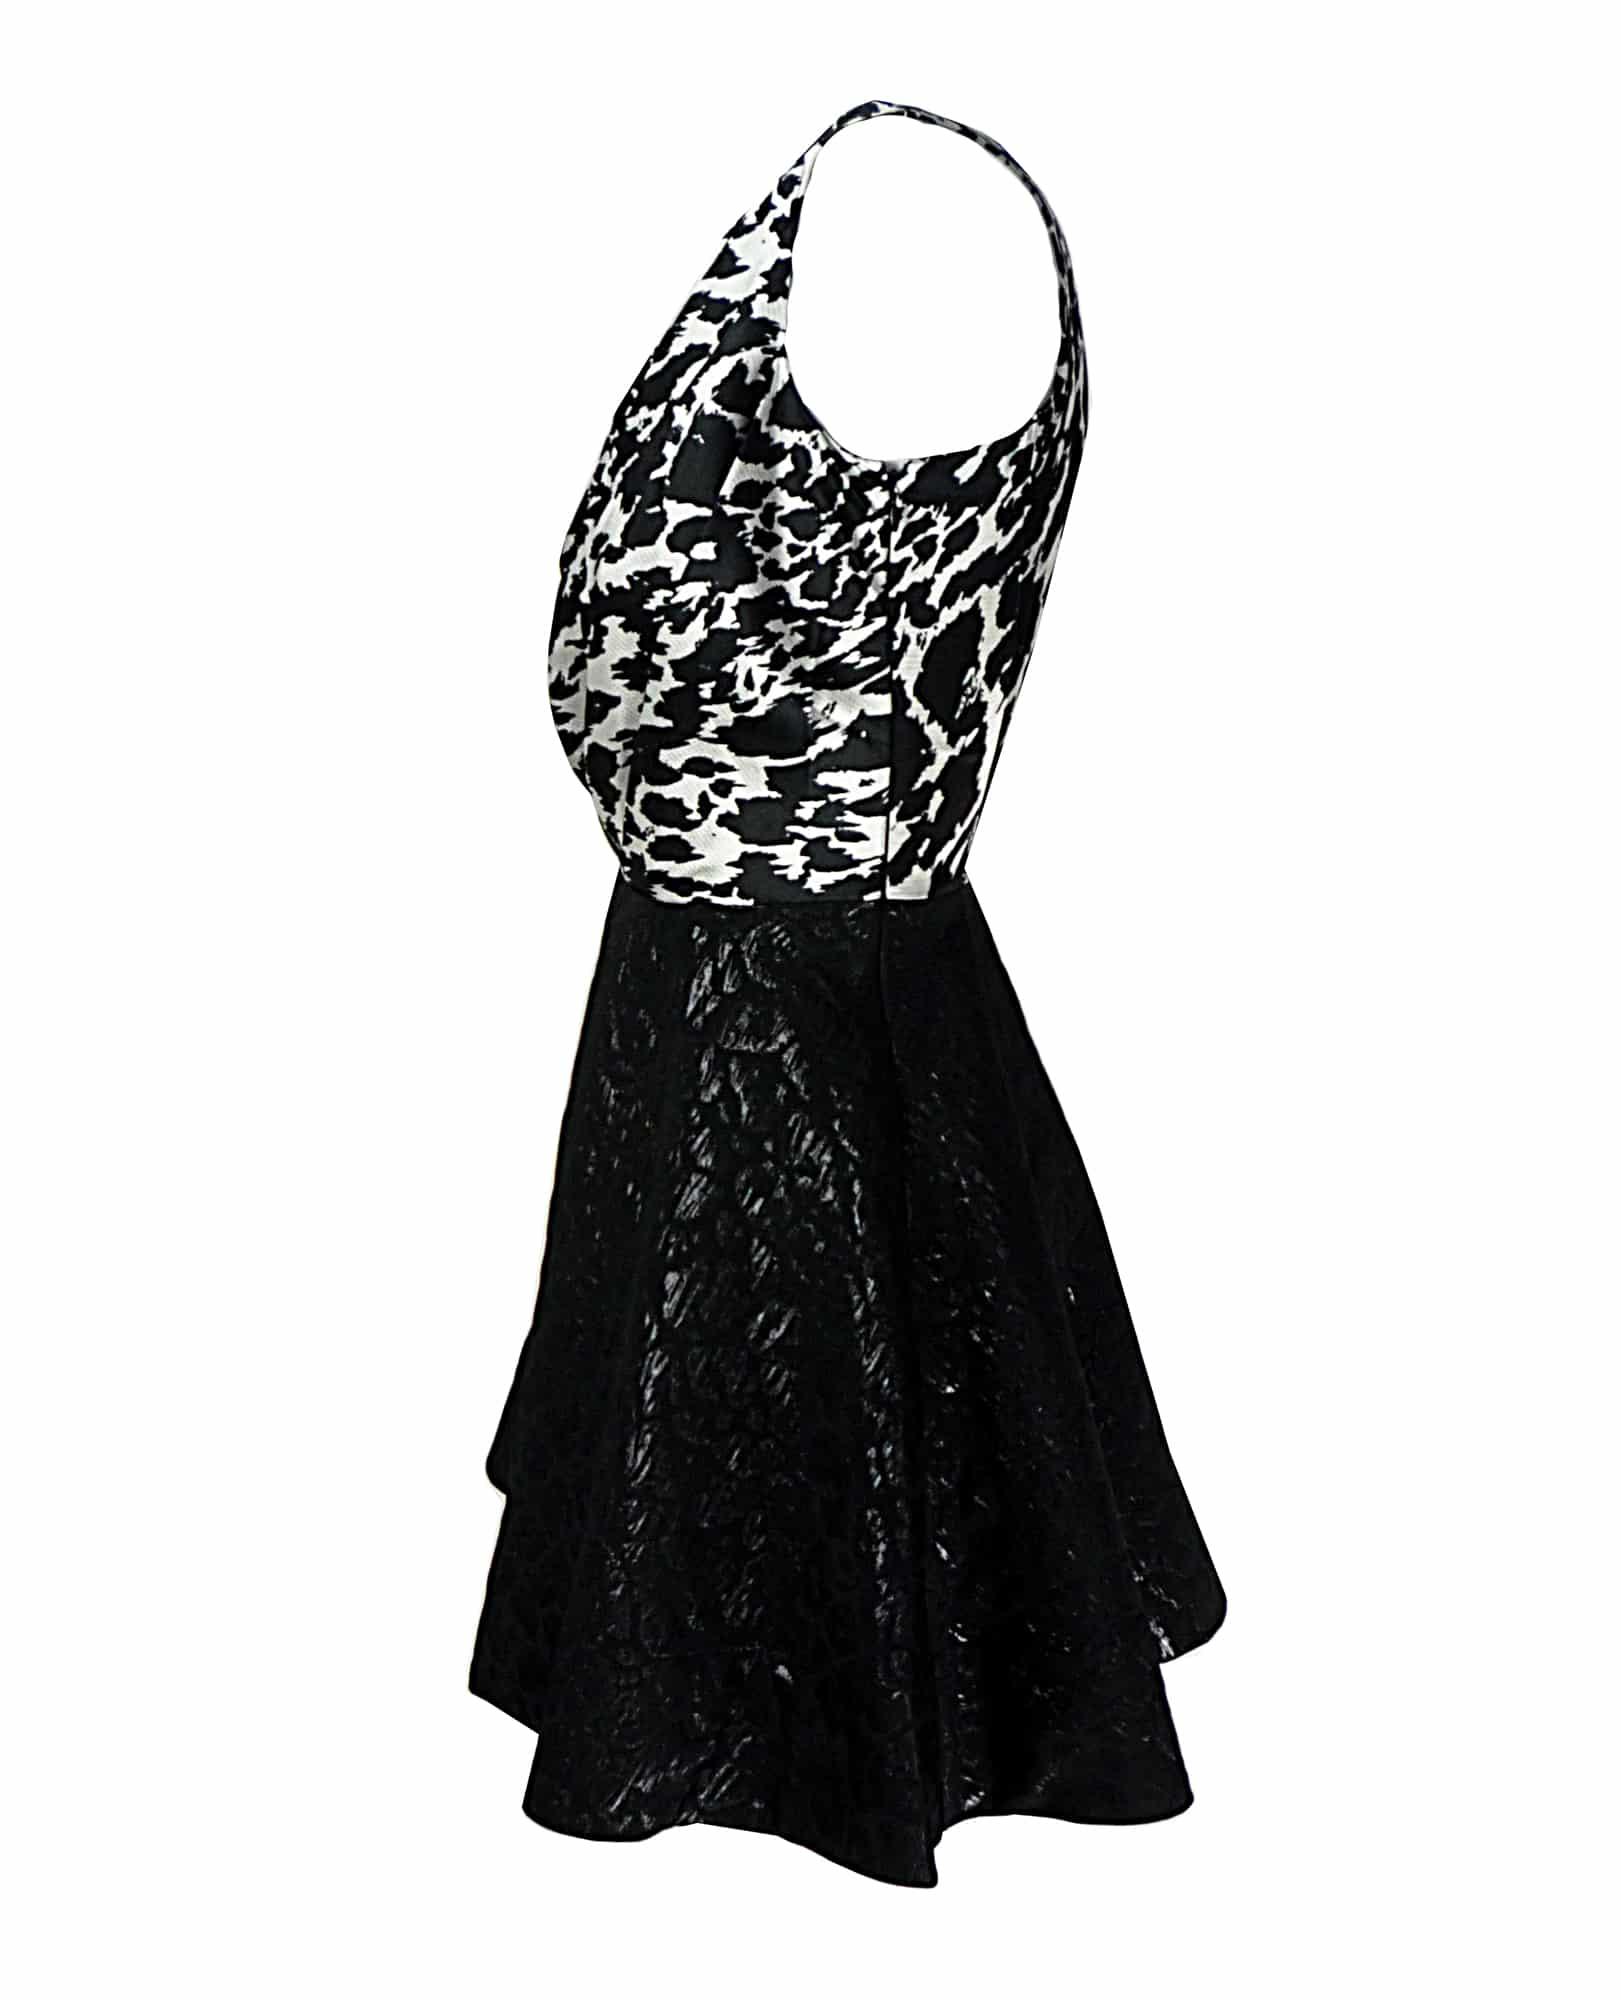 Oliva Rubin NICOLA Black & White Print Skater Dress